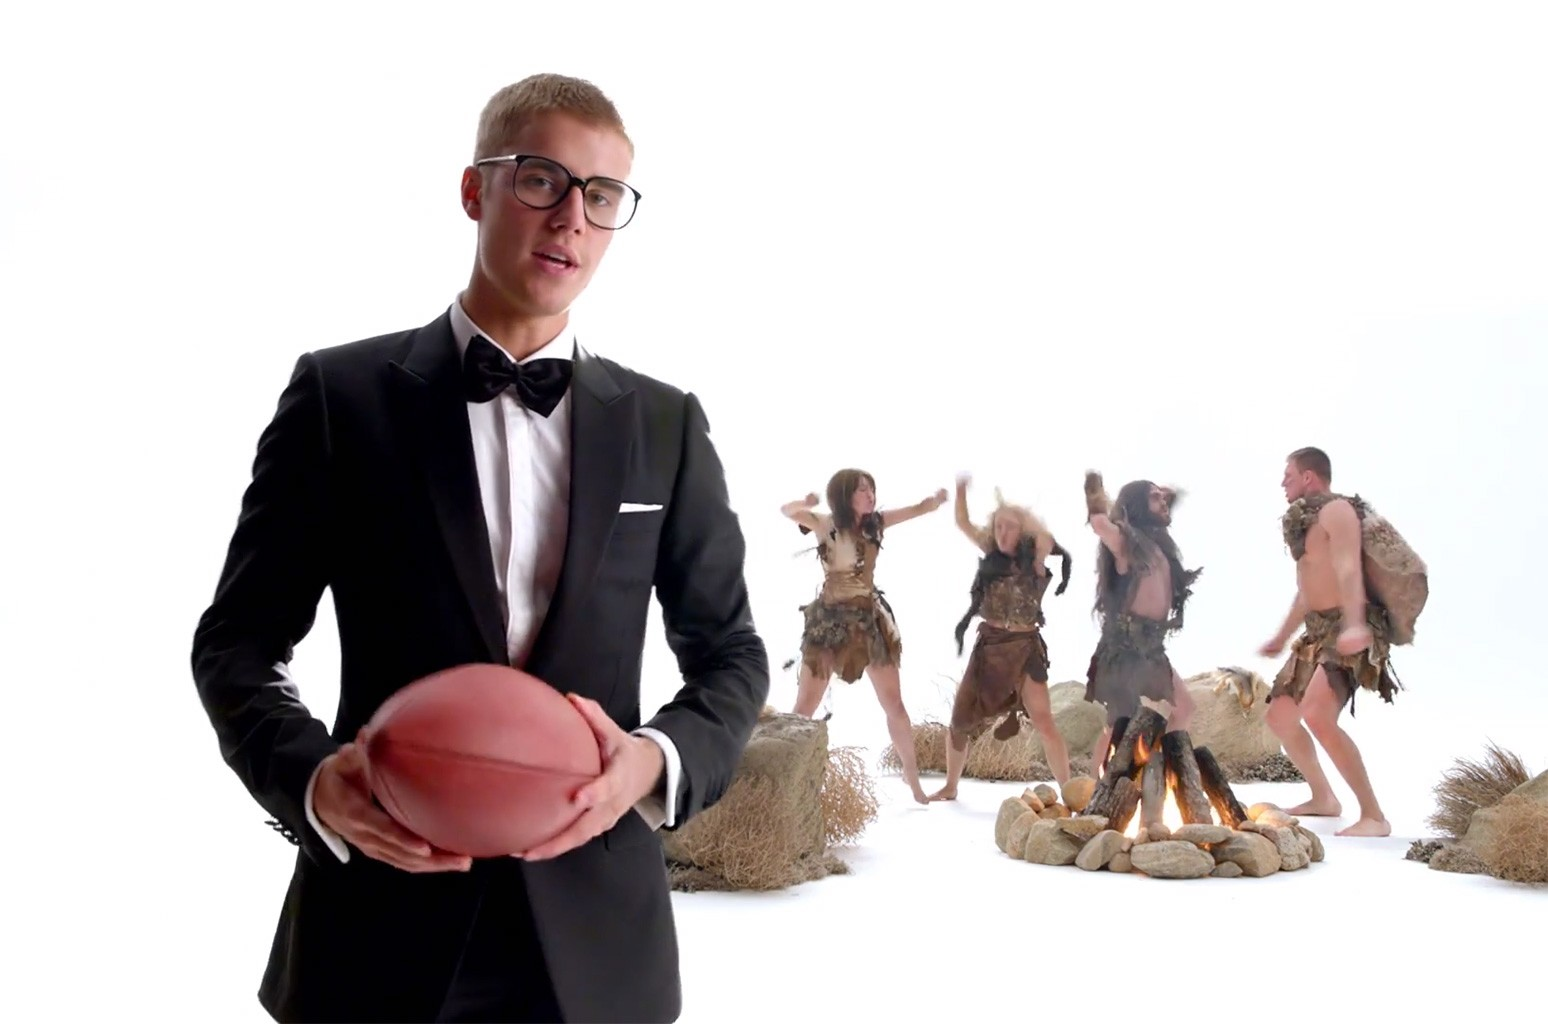 Justin Bieber in T-Mobile commercial #UnlimitedMoves